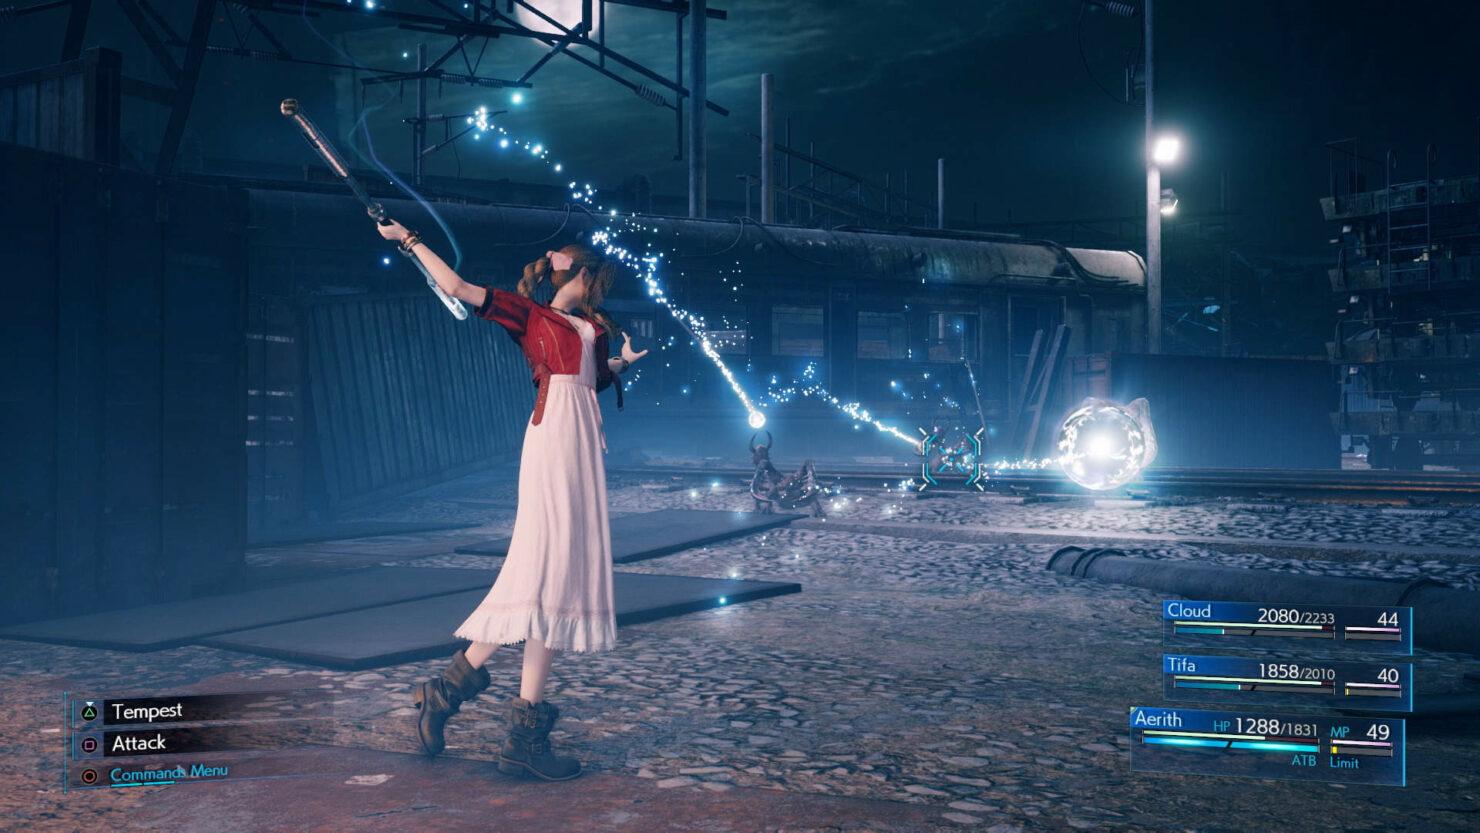 final-fantasy-vii-remake-screenshots-info-49